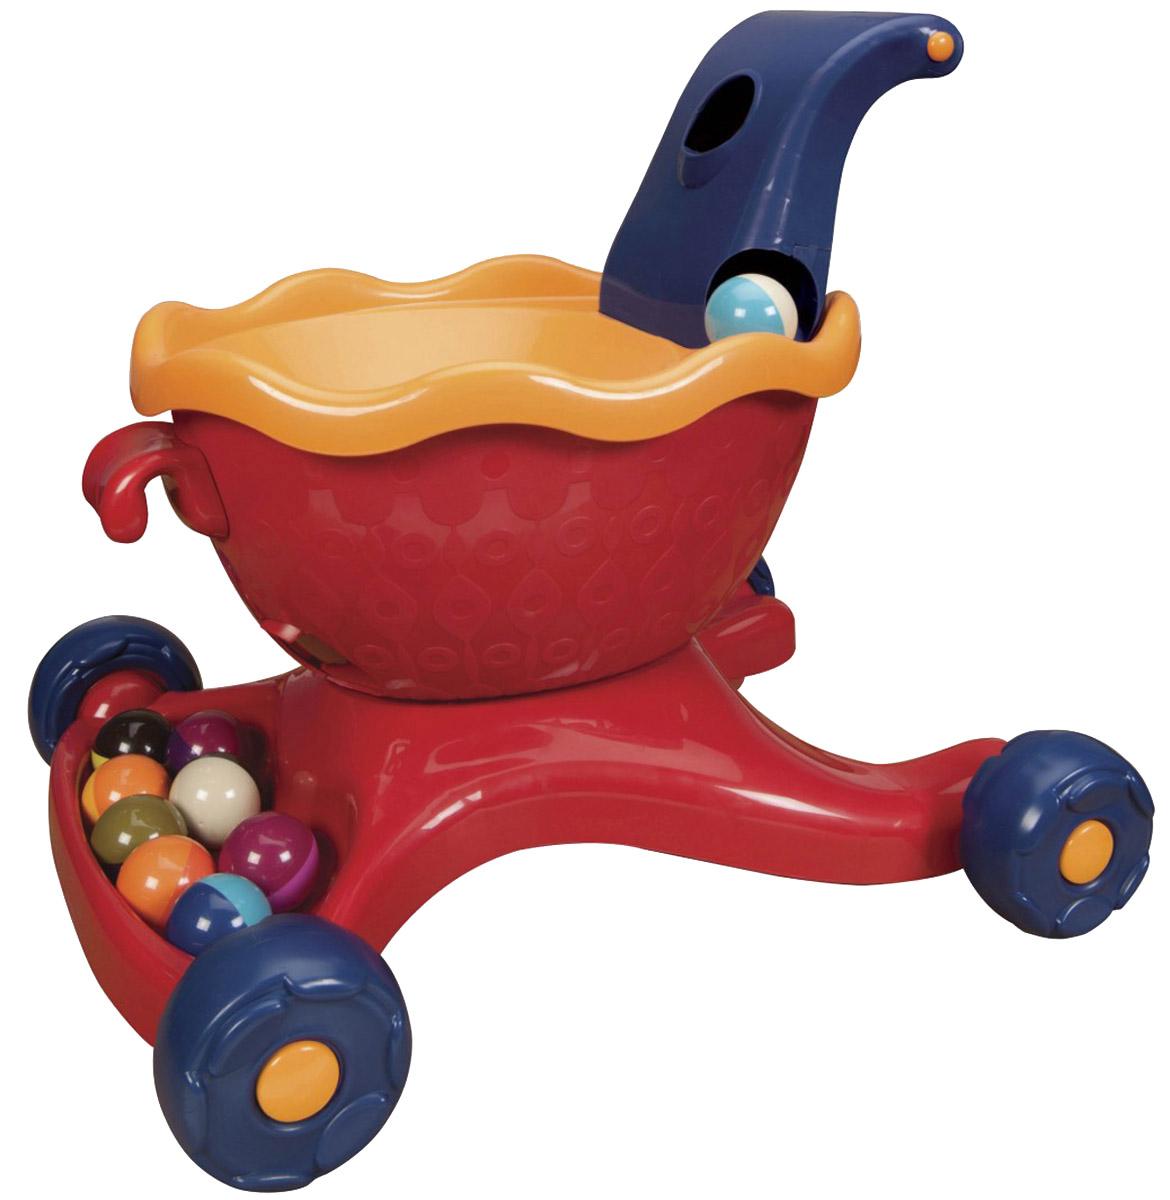 B.Dot Каталка-ходунки с шариками Walkness Monster цвет красный -  Ходунки, прыгунки, качалки